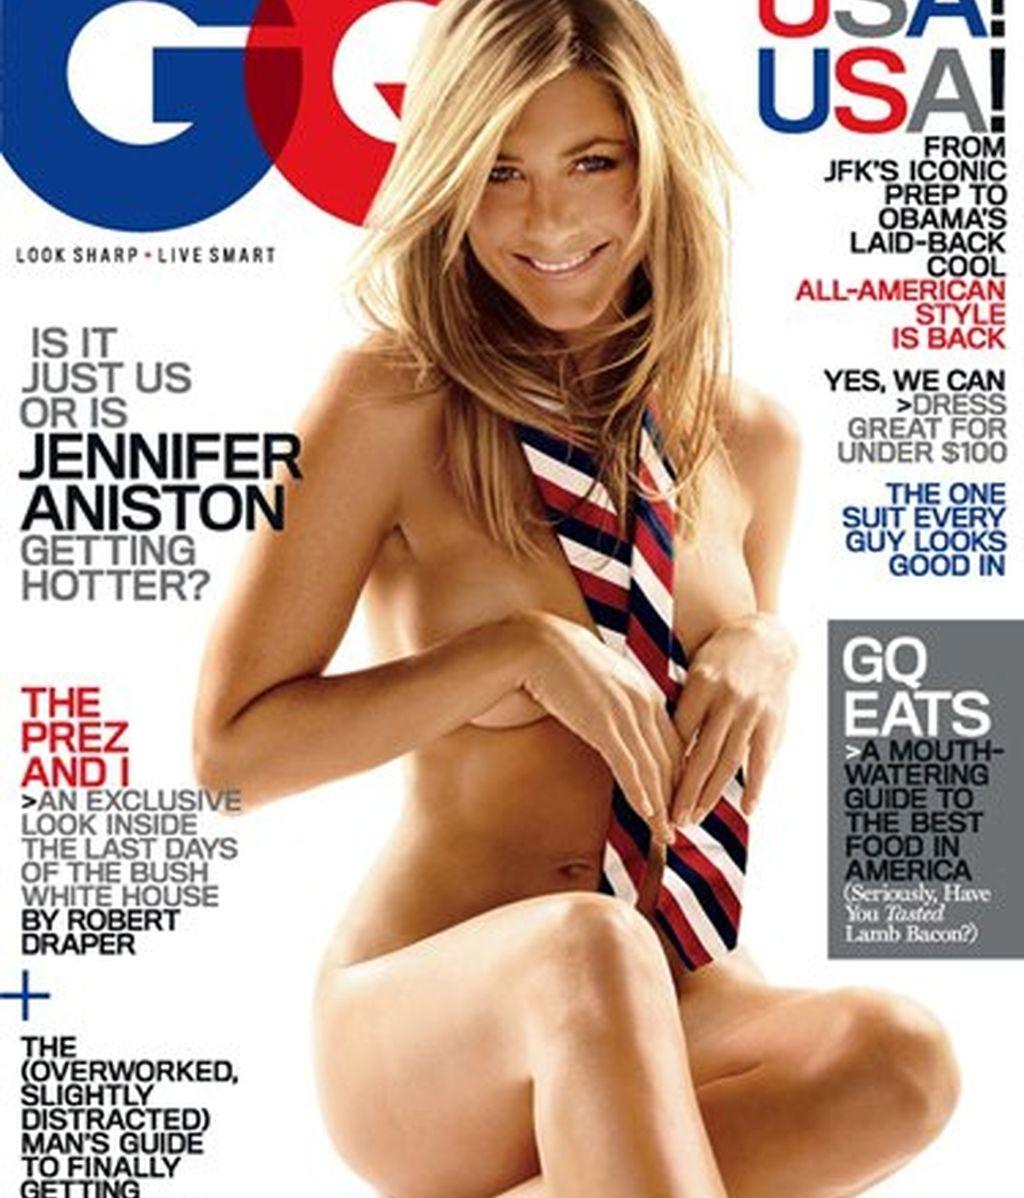 Jennifer Aniston vuelve a posar en topless sin enseñar nada